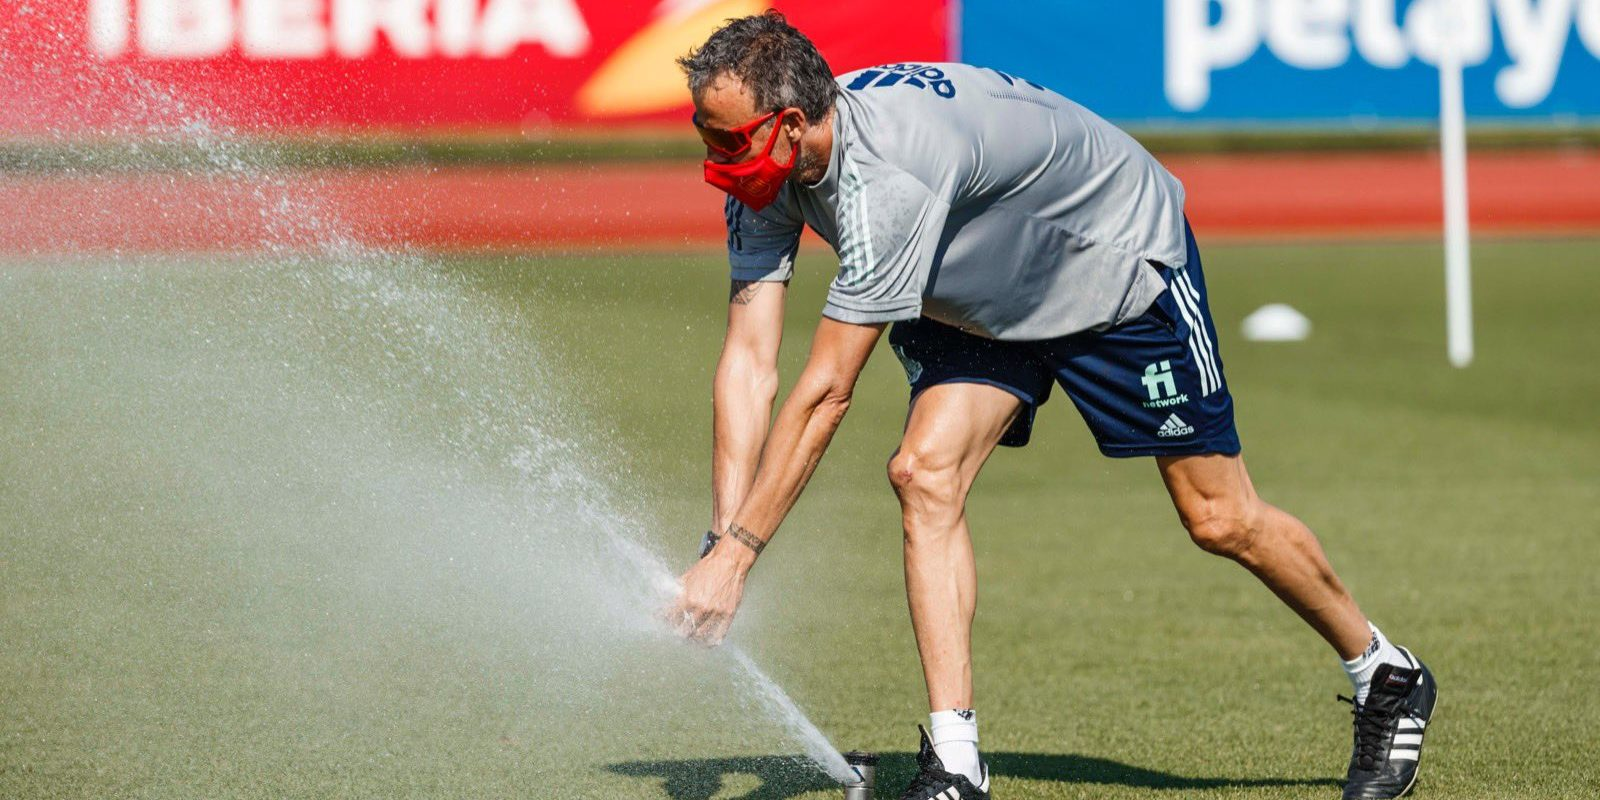 Luis Enrique, durant la preparació de l'Eurocopa | Europa Press